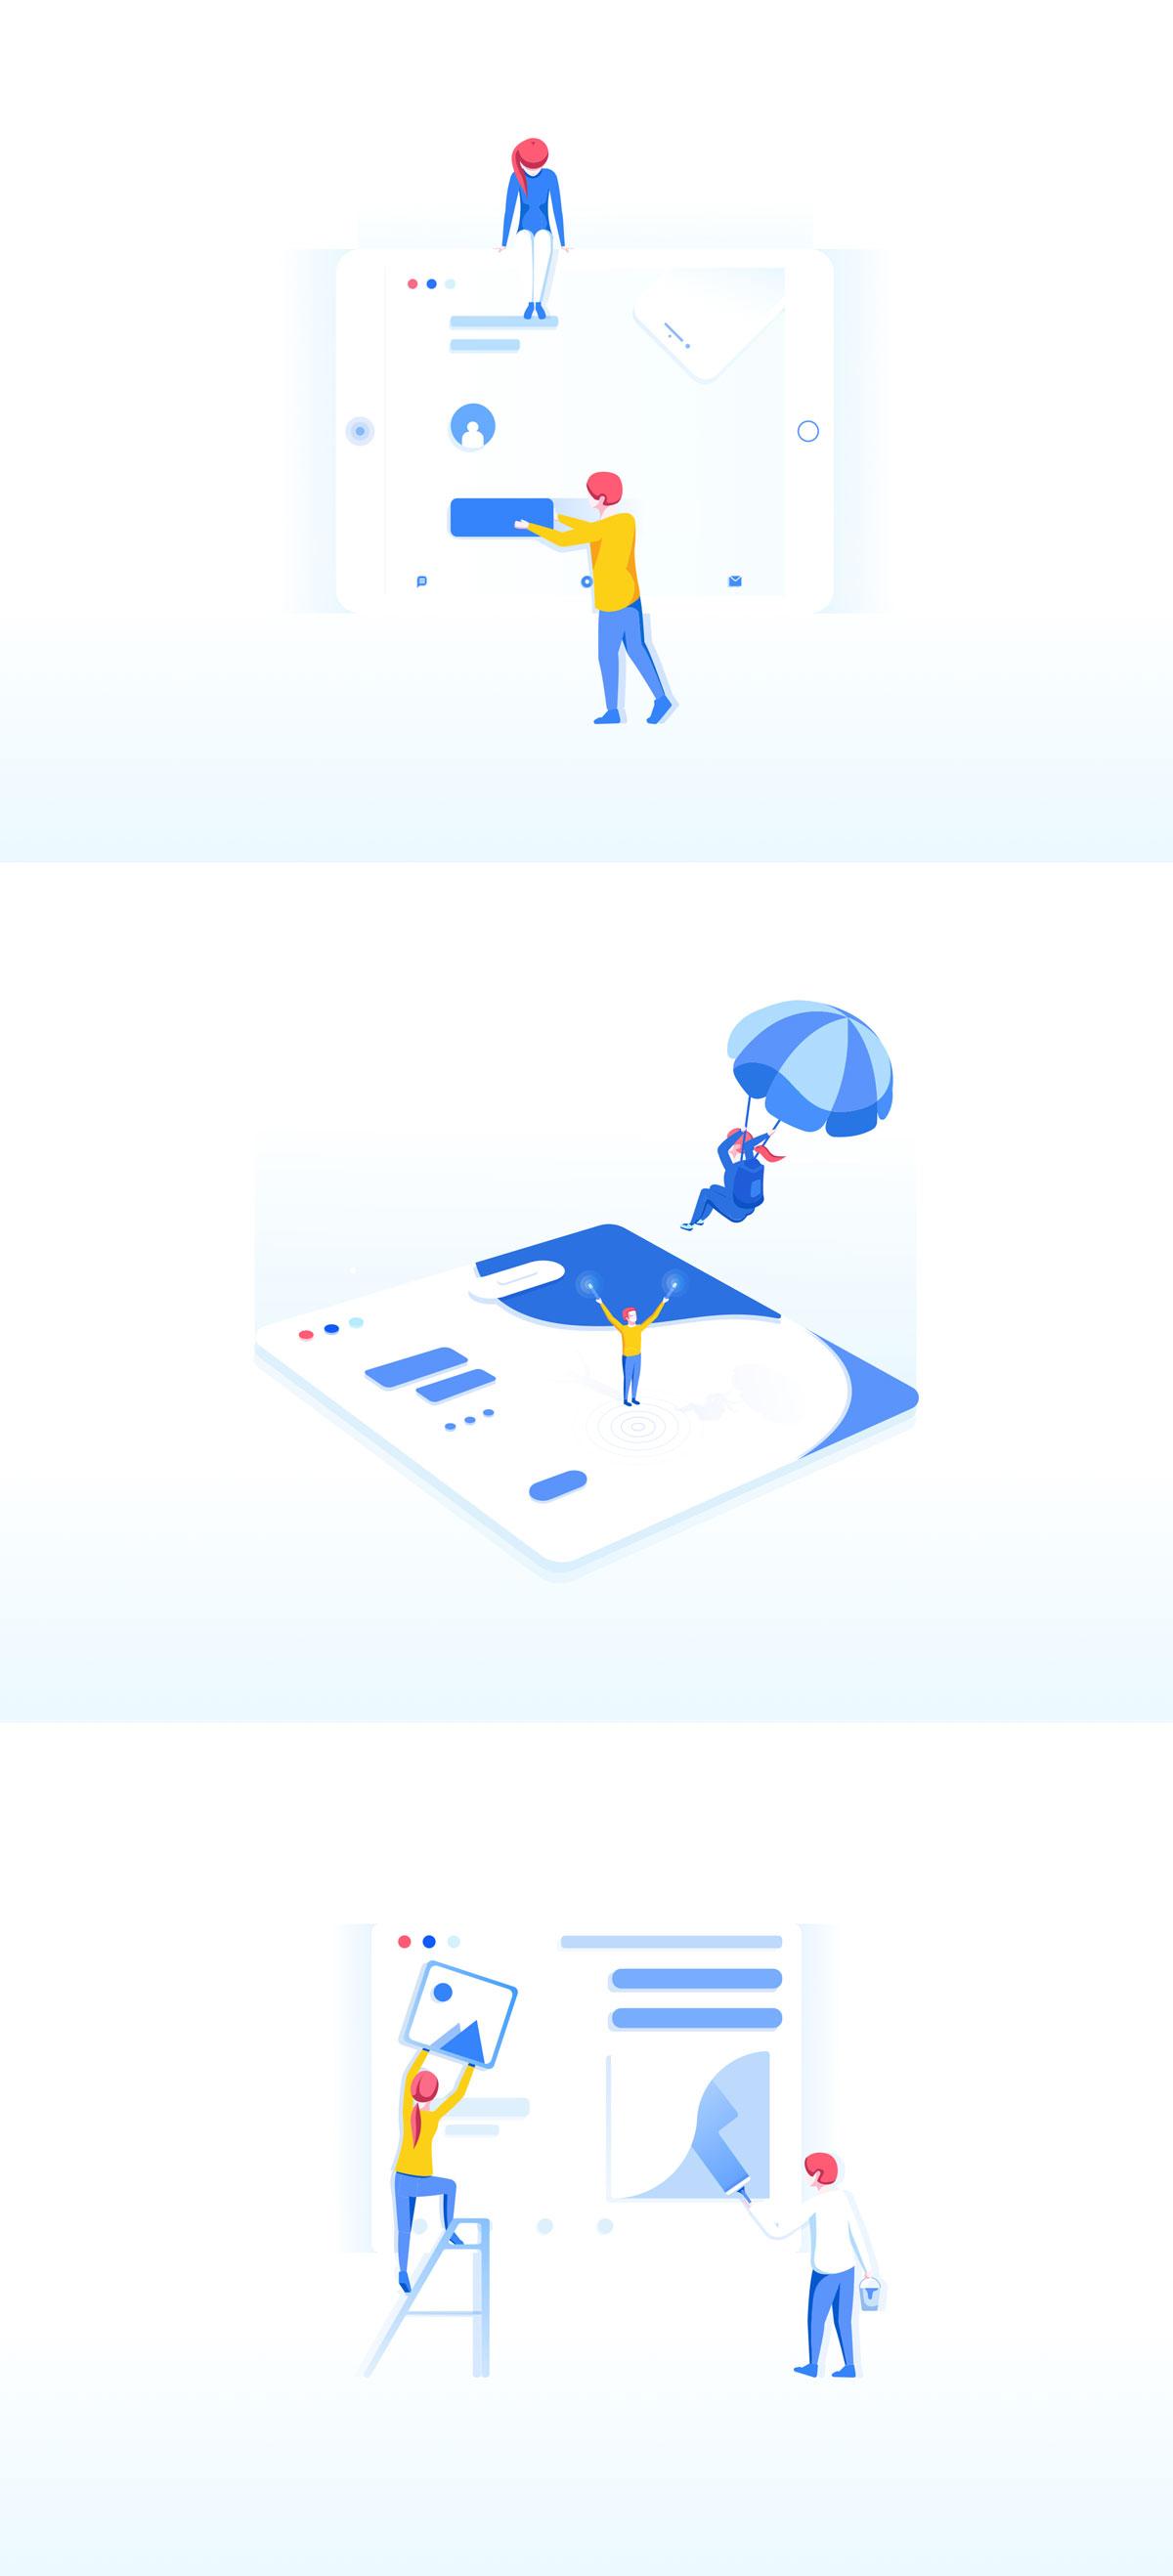 精心设计的团队合作和协作EPS矢量插图 Teamwork & Collaboration Illustrations插图(9)